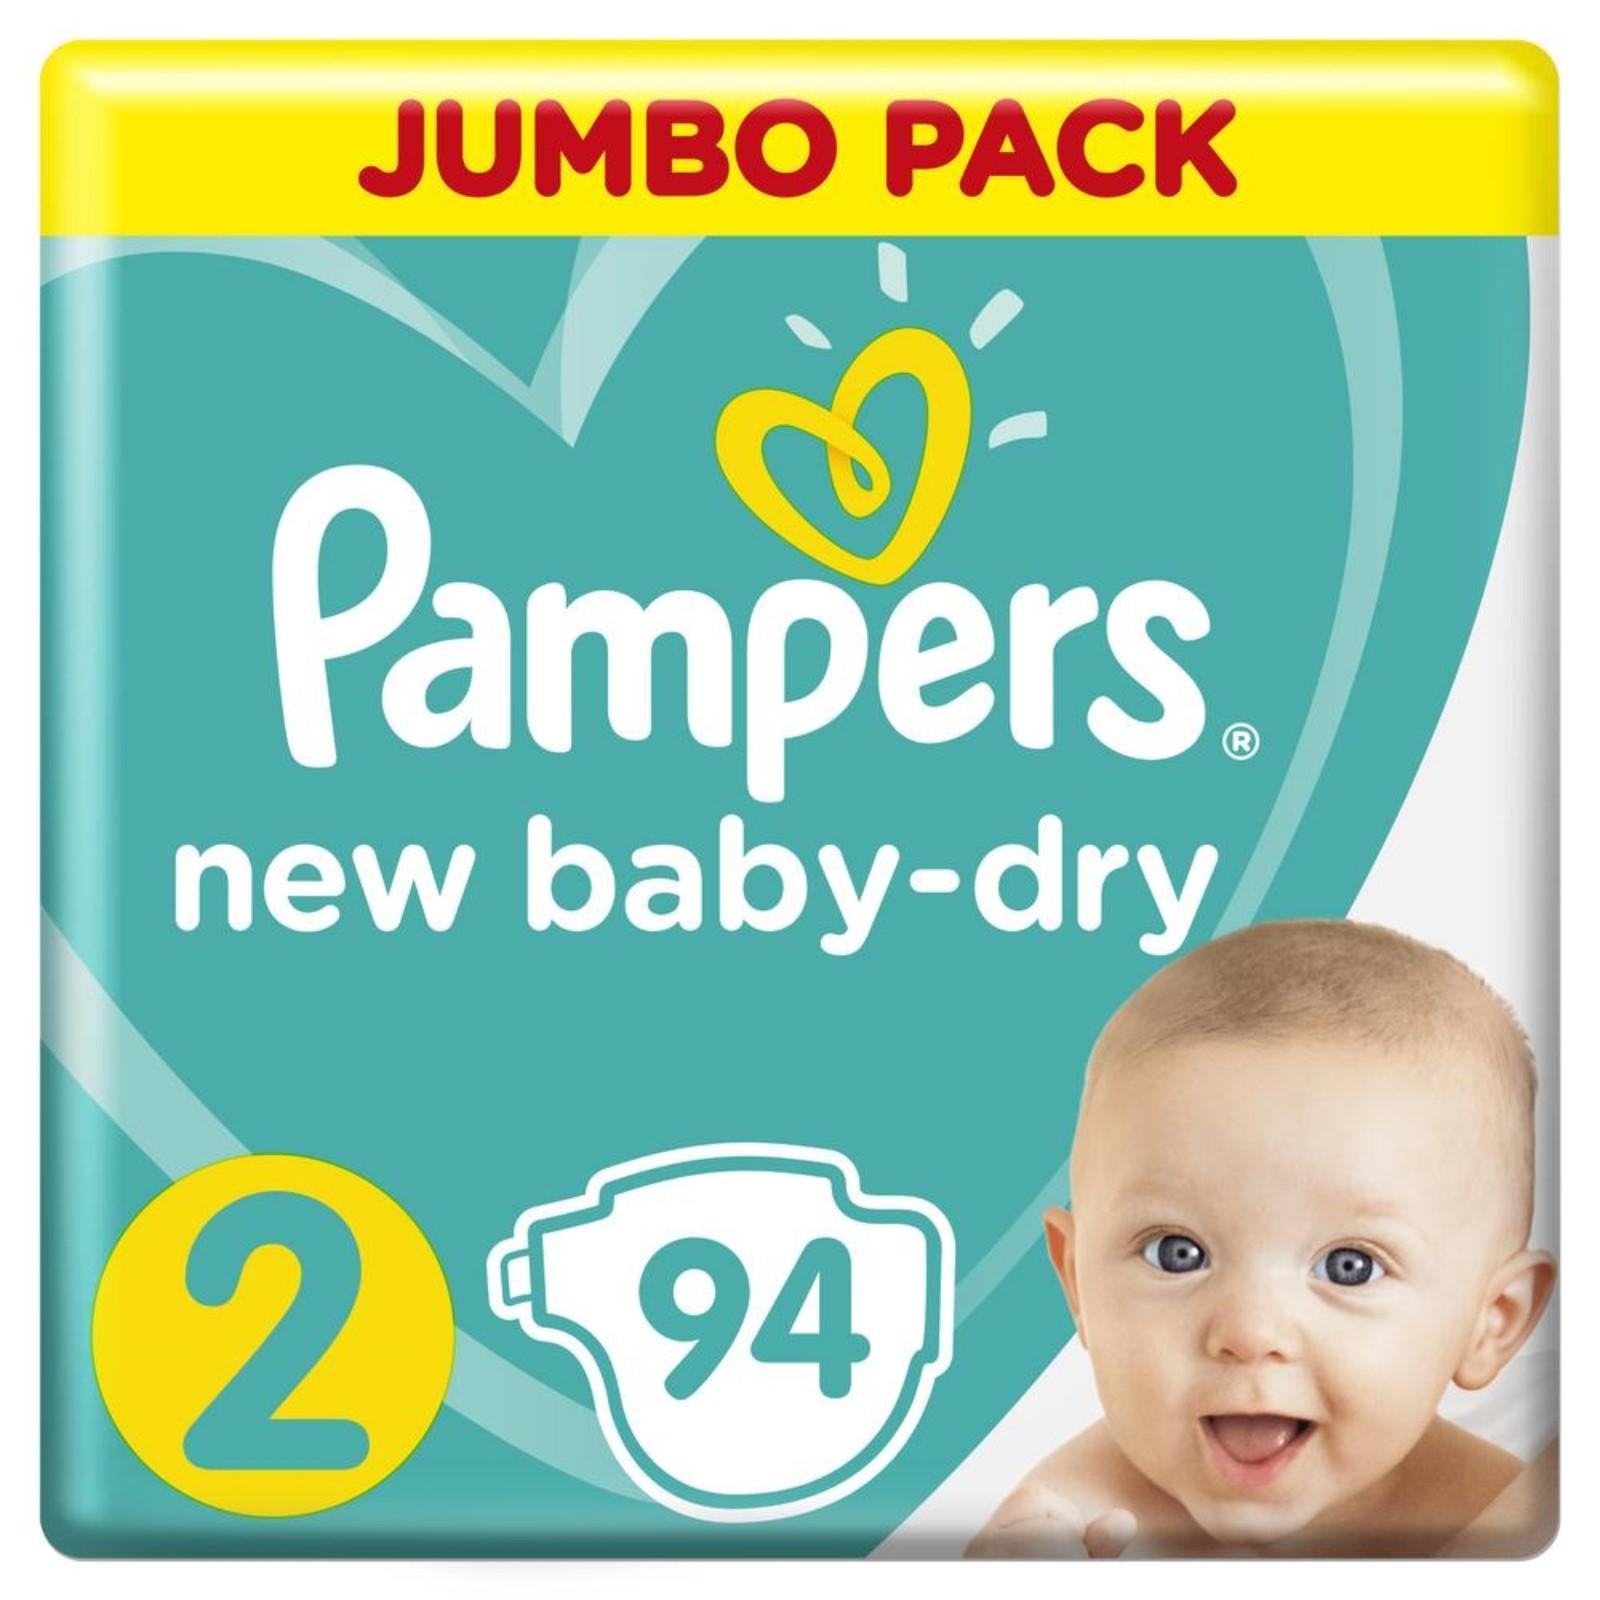 c93dd1343035 Подгузники Pampers New Baby-dry, Mini 2 (4-8 кг), 94 шт. (1156452 ...